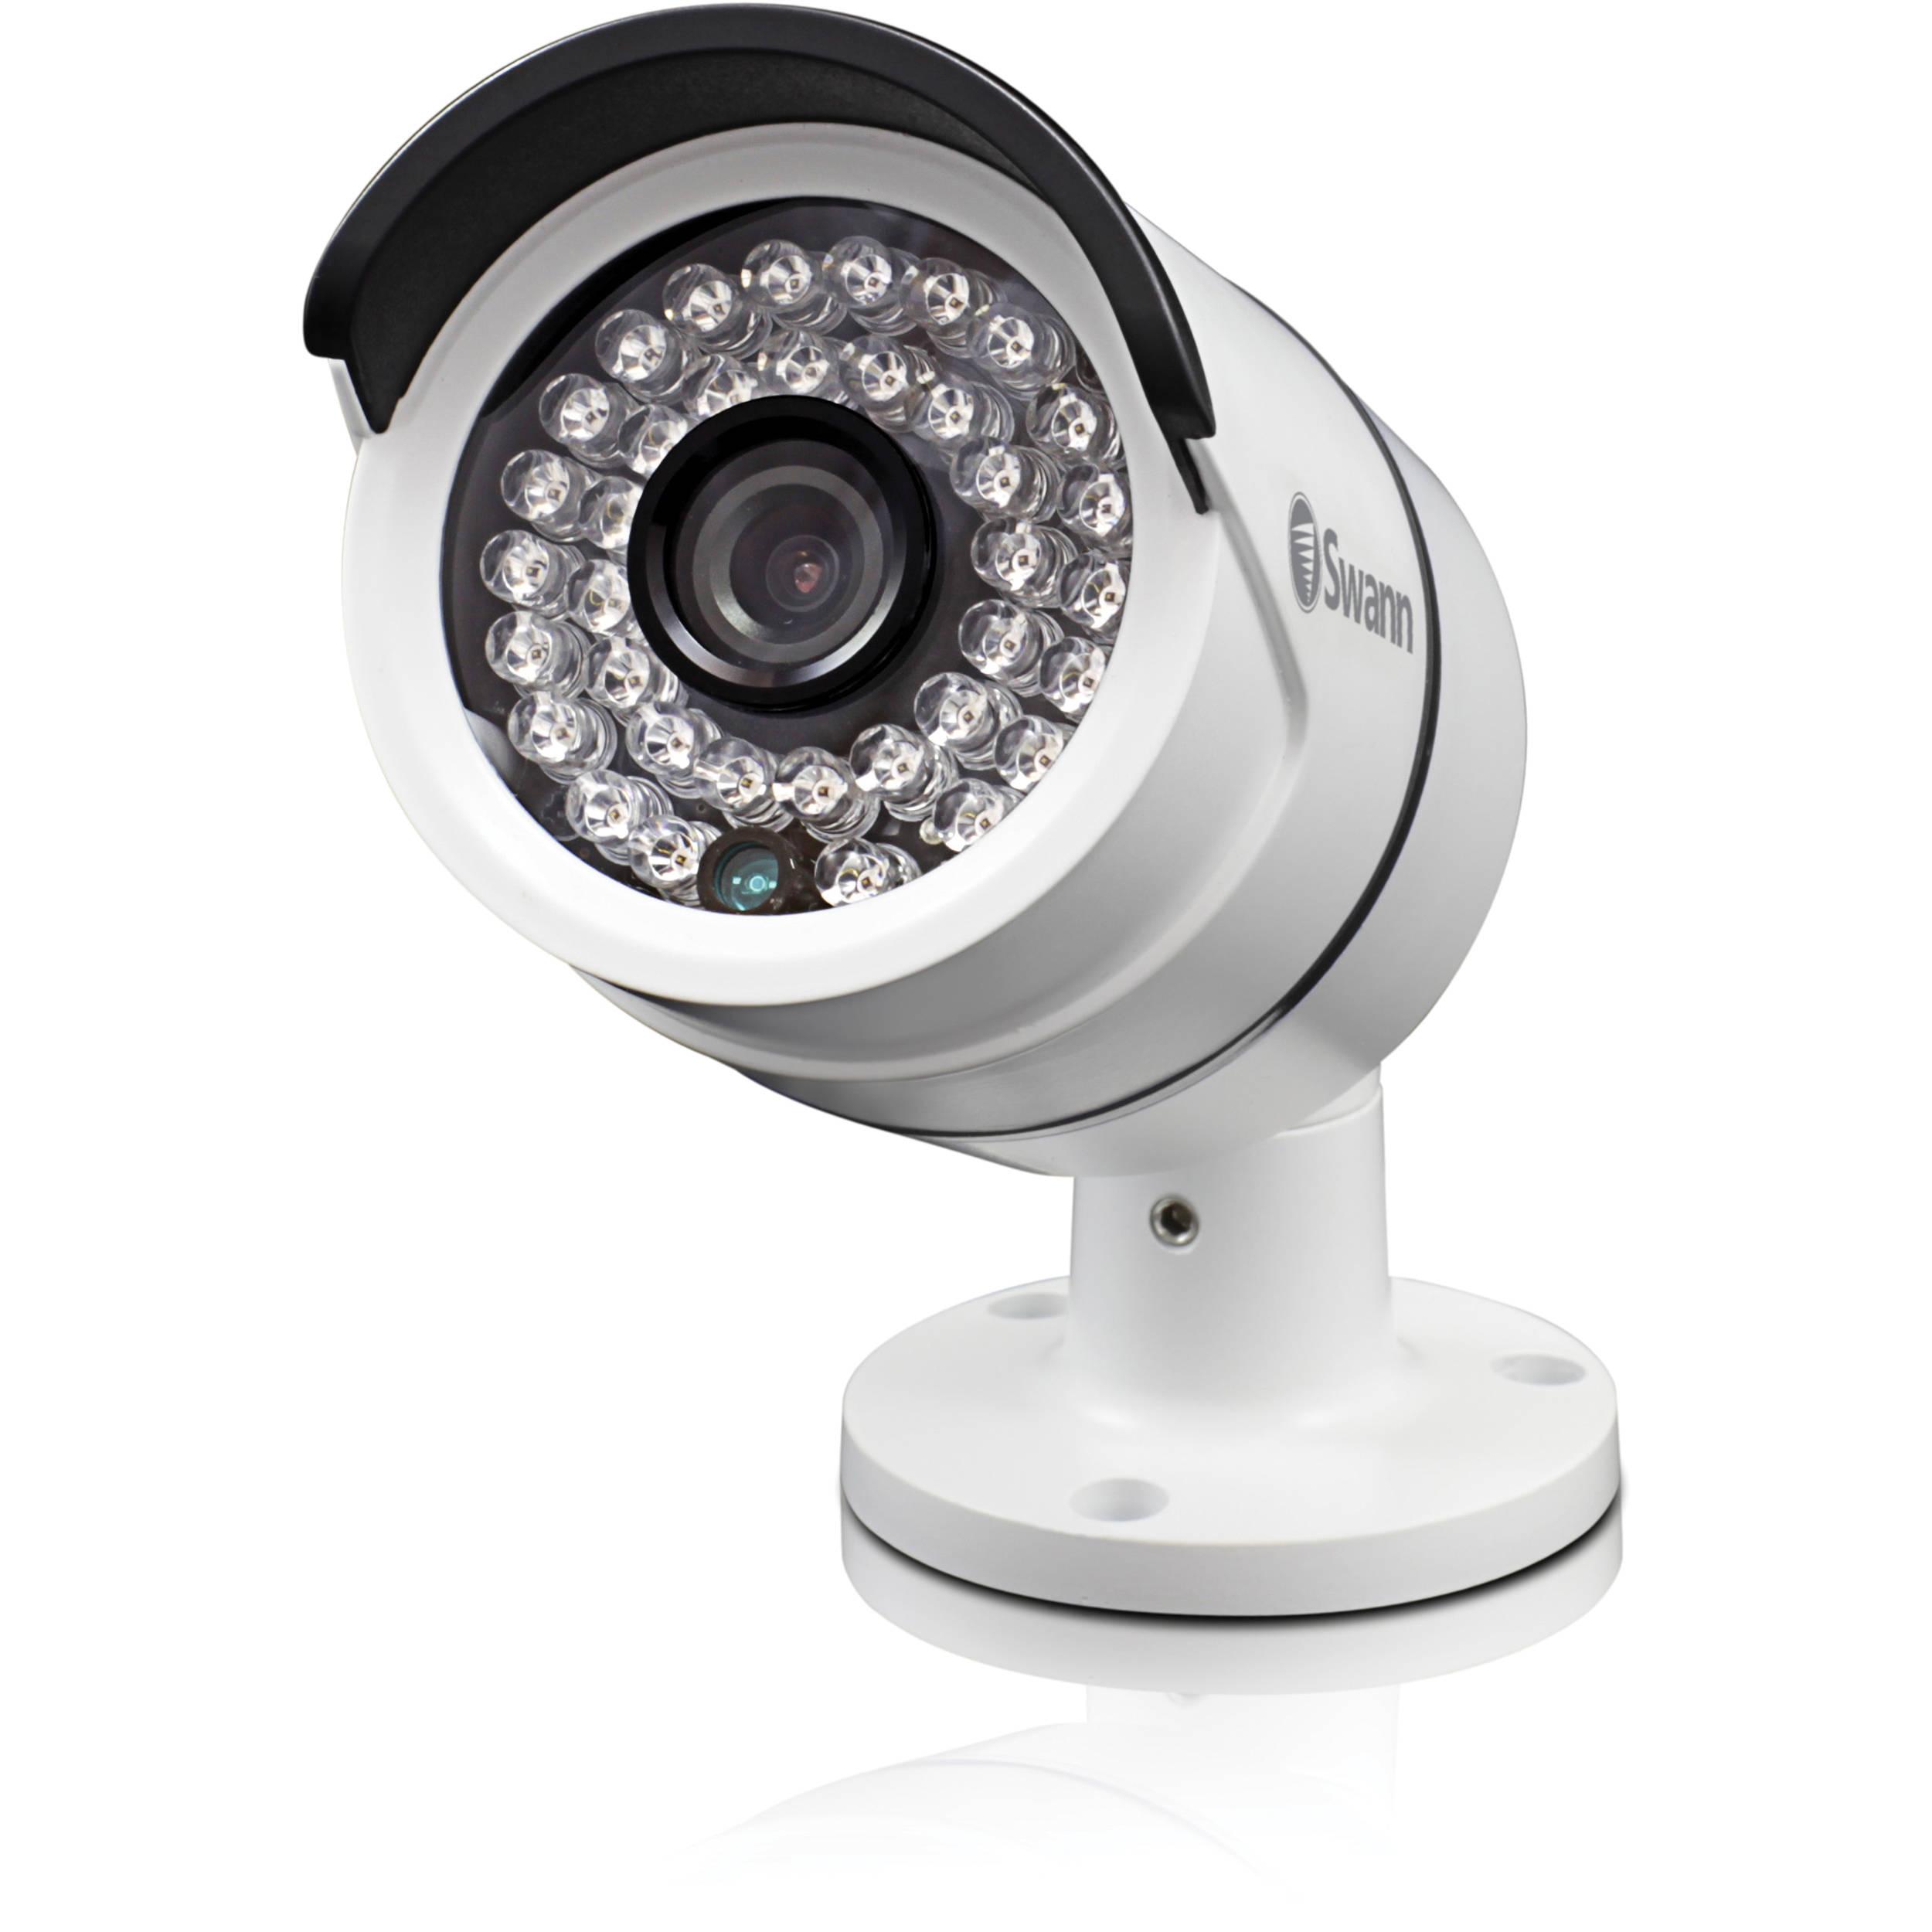 Swann NHD-806 720p HD IP Bullet Camera SWNHD-806CAM-US B&H Photo